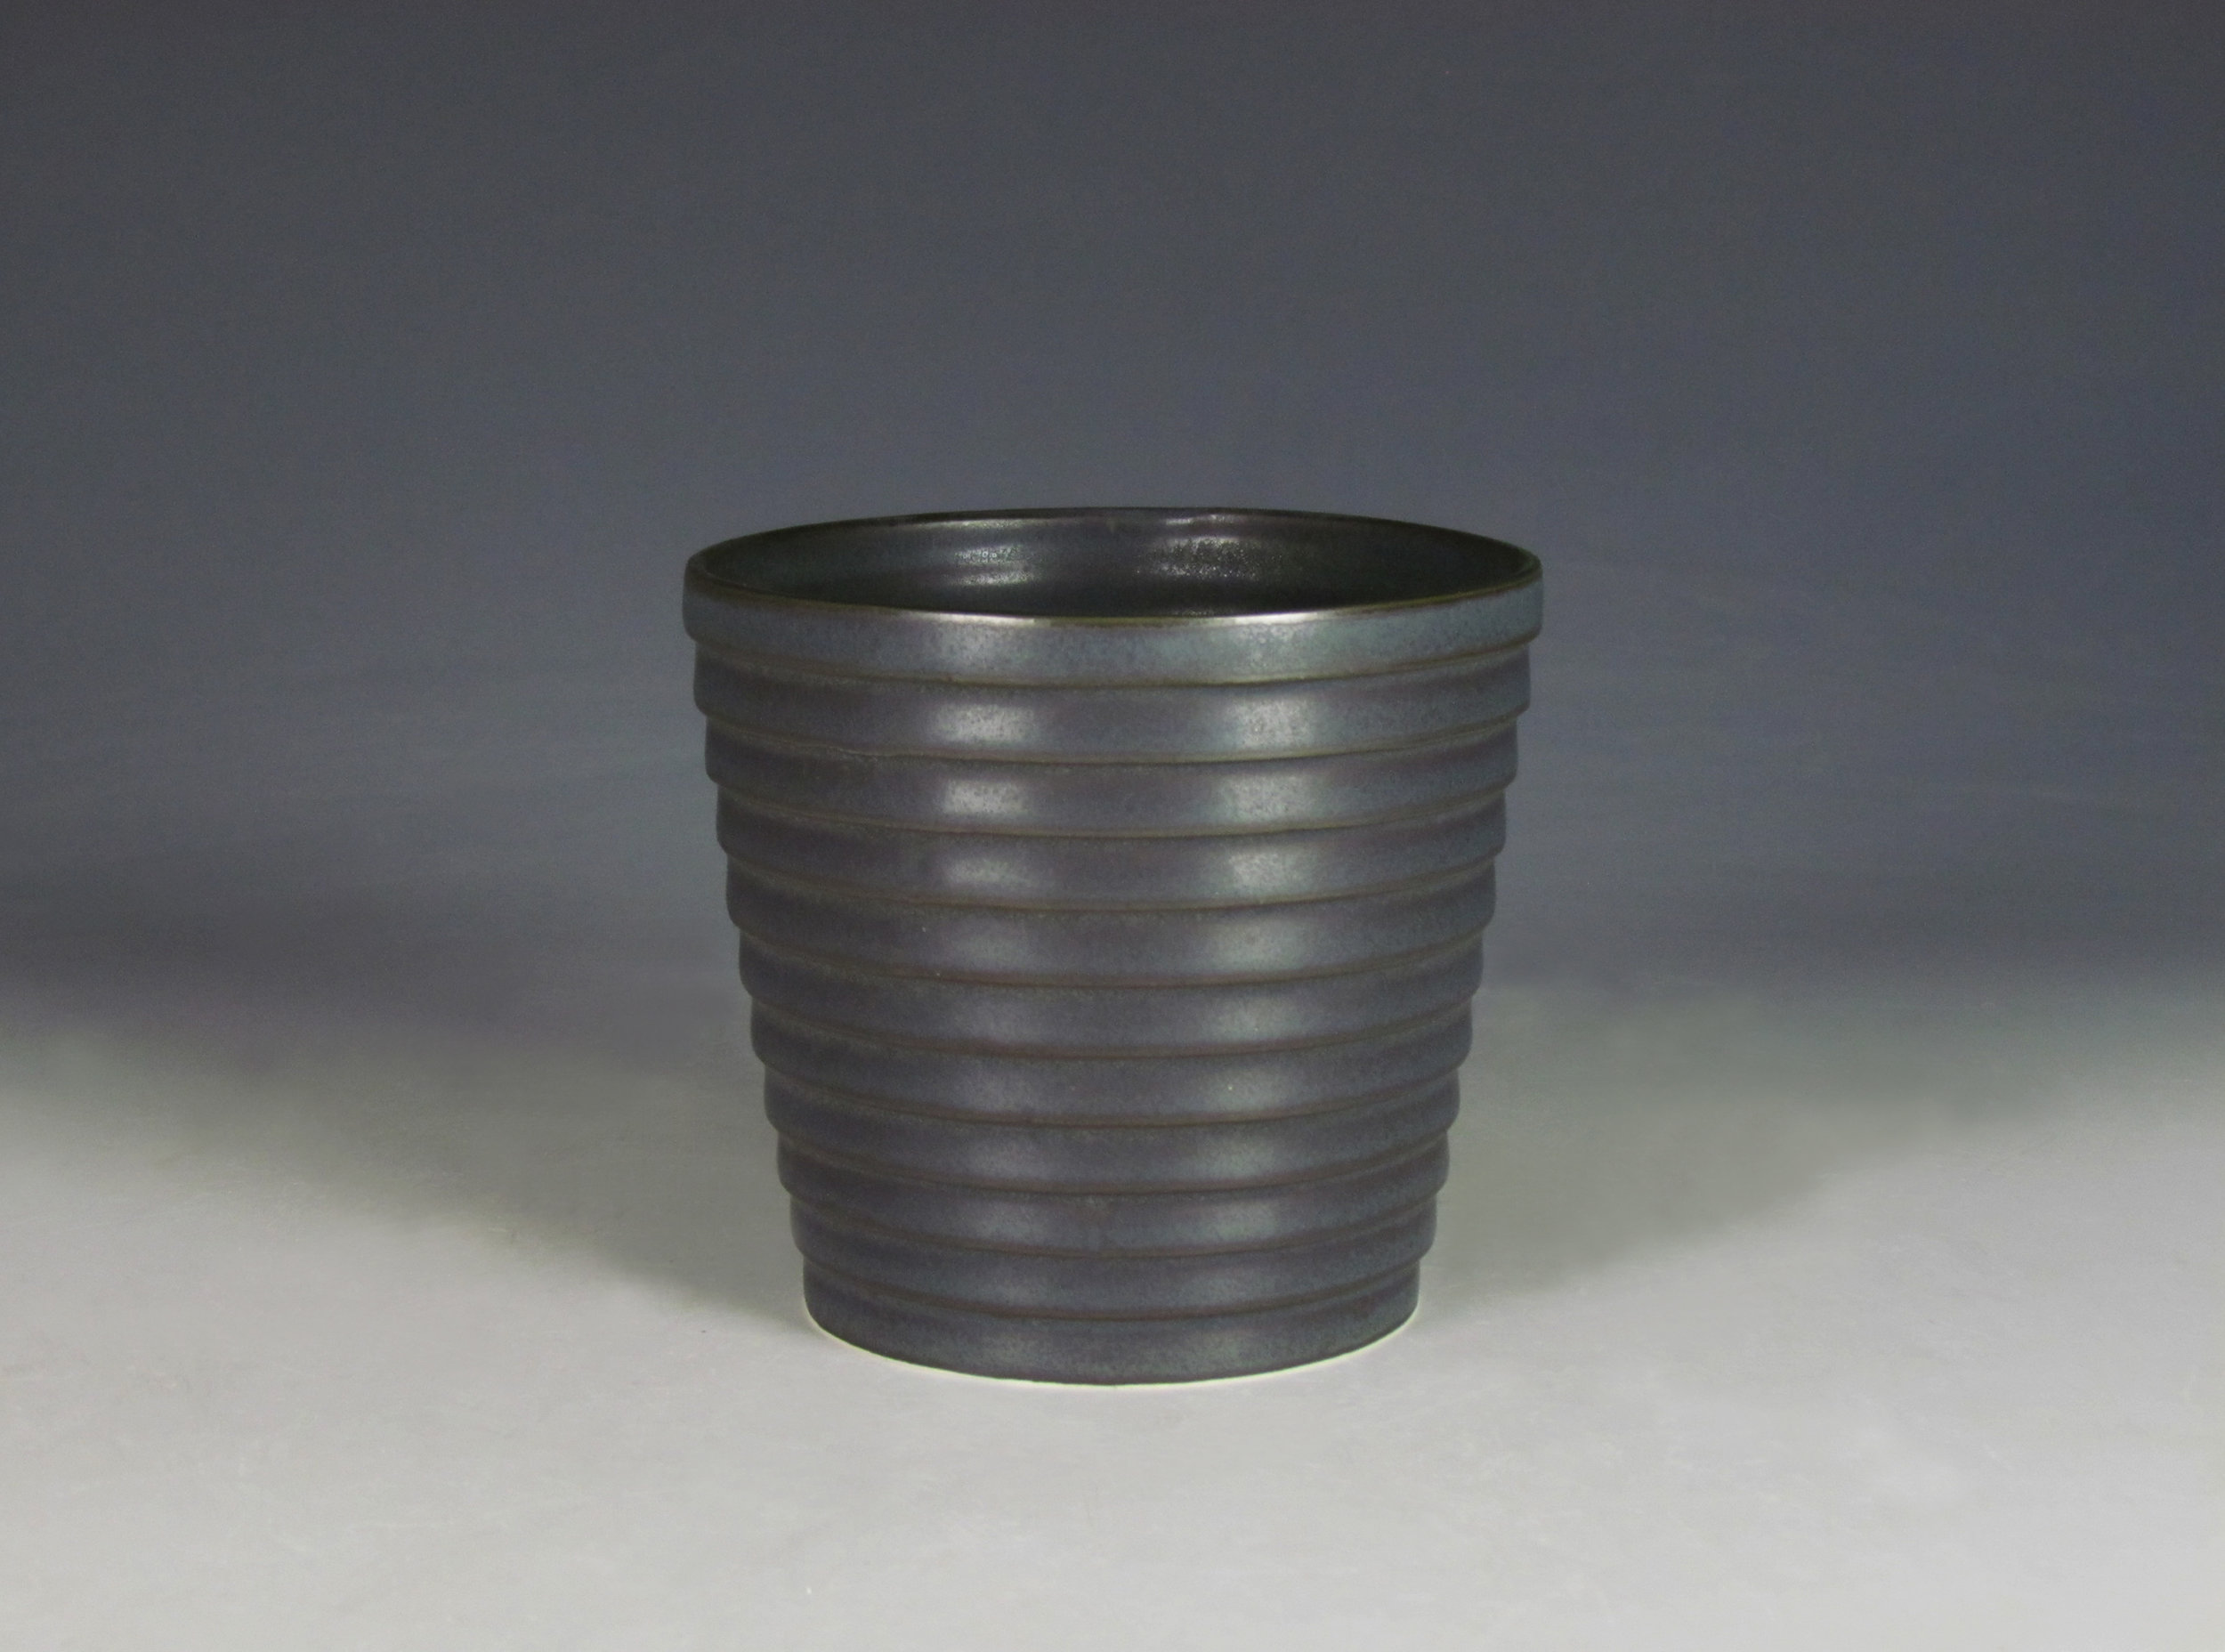 Cup (Black)  |  6 x 4 x 4 inches  |  Porcelain, Glaze  |  2016